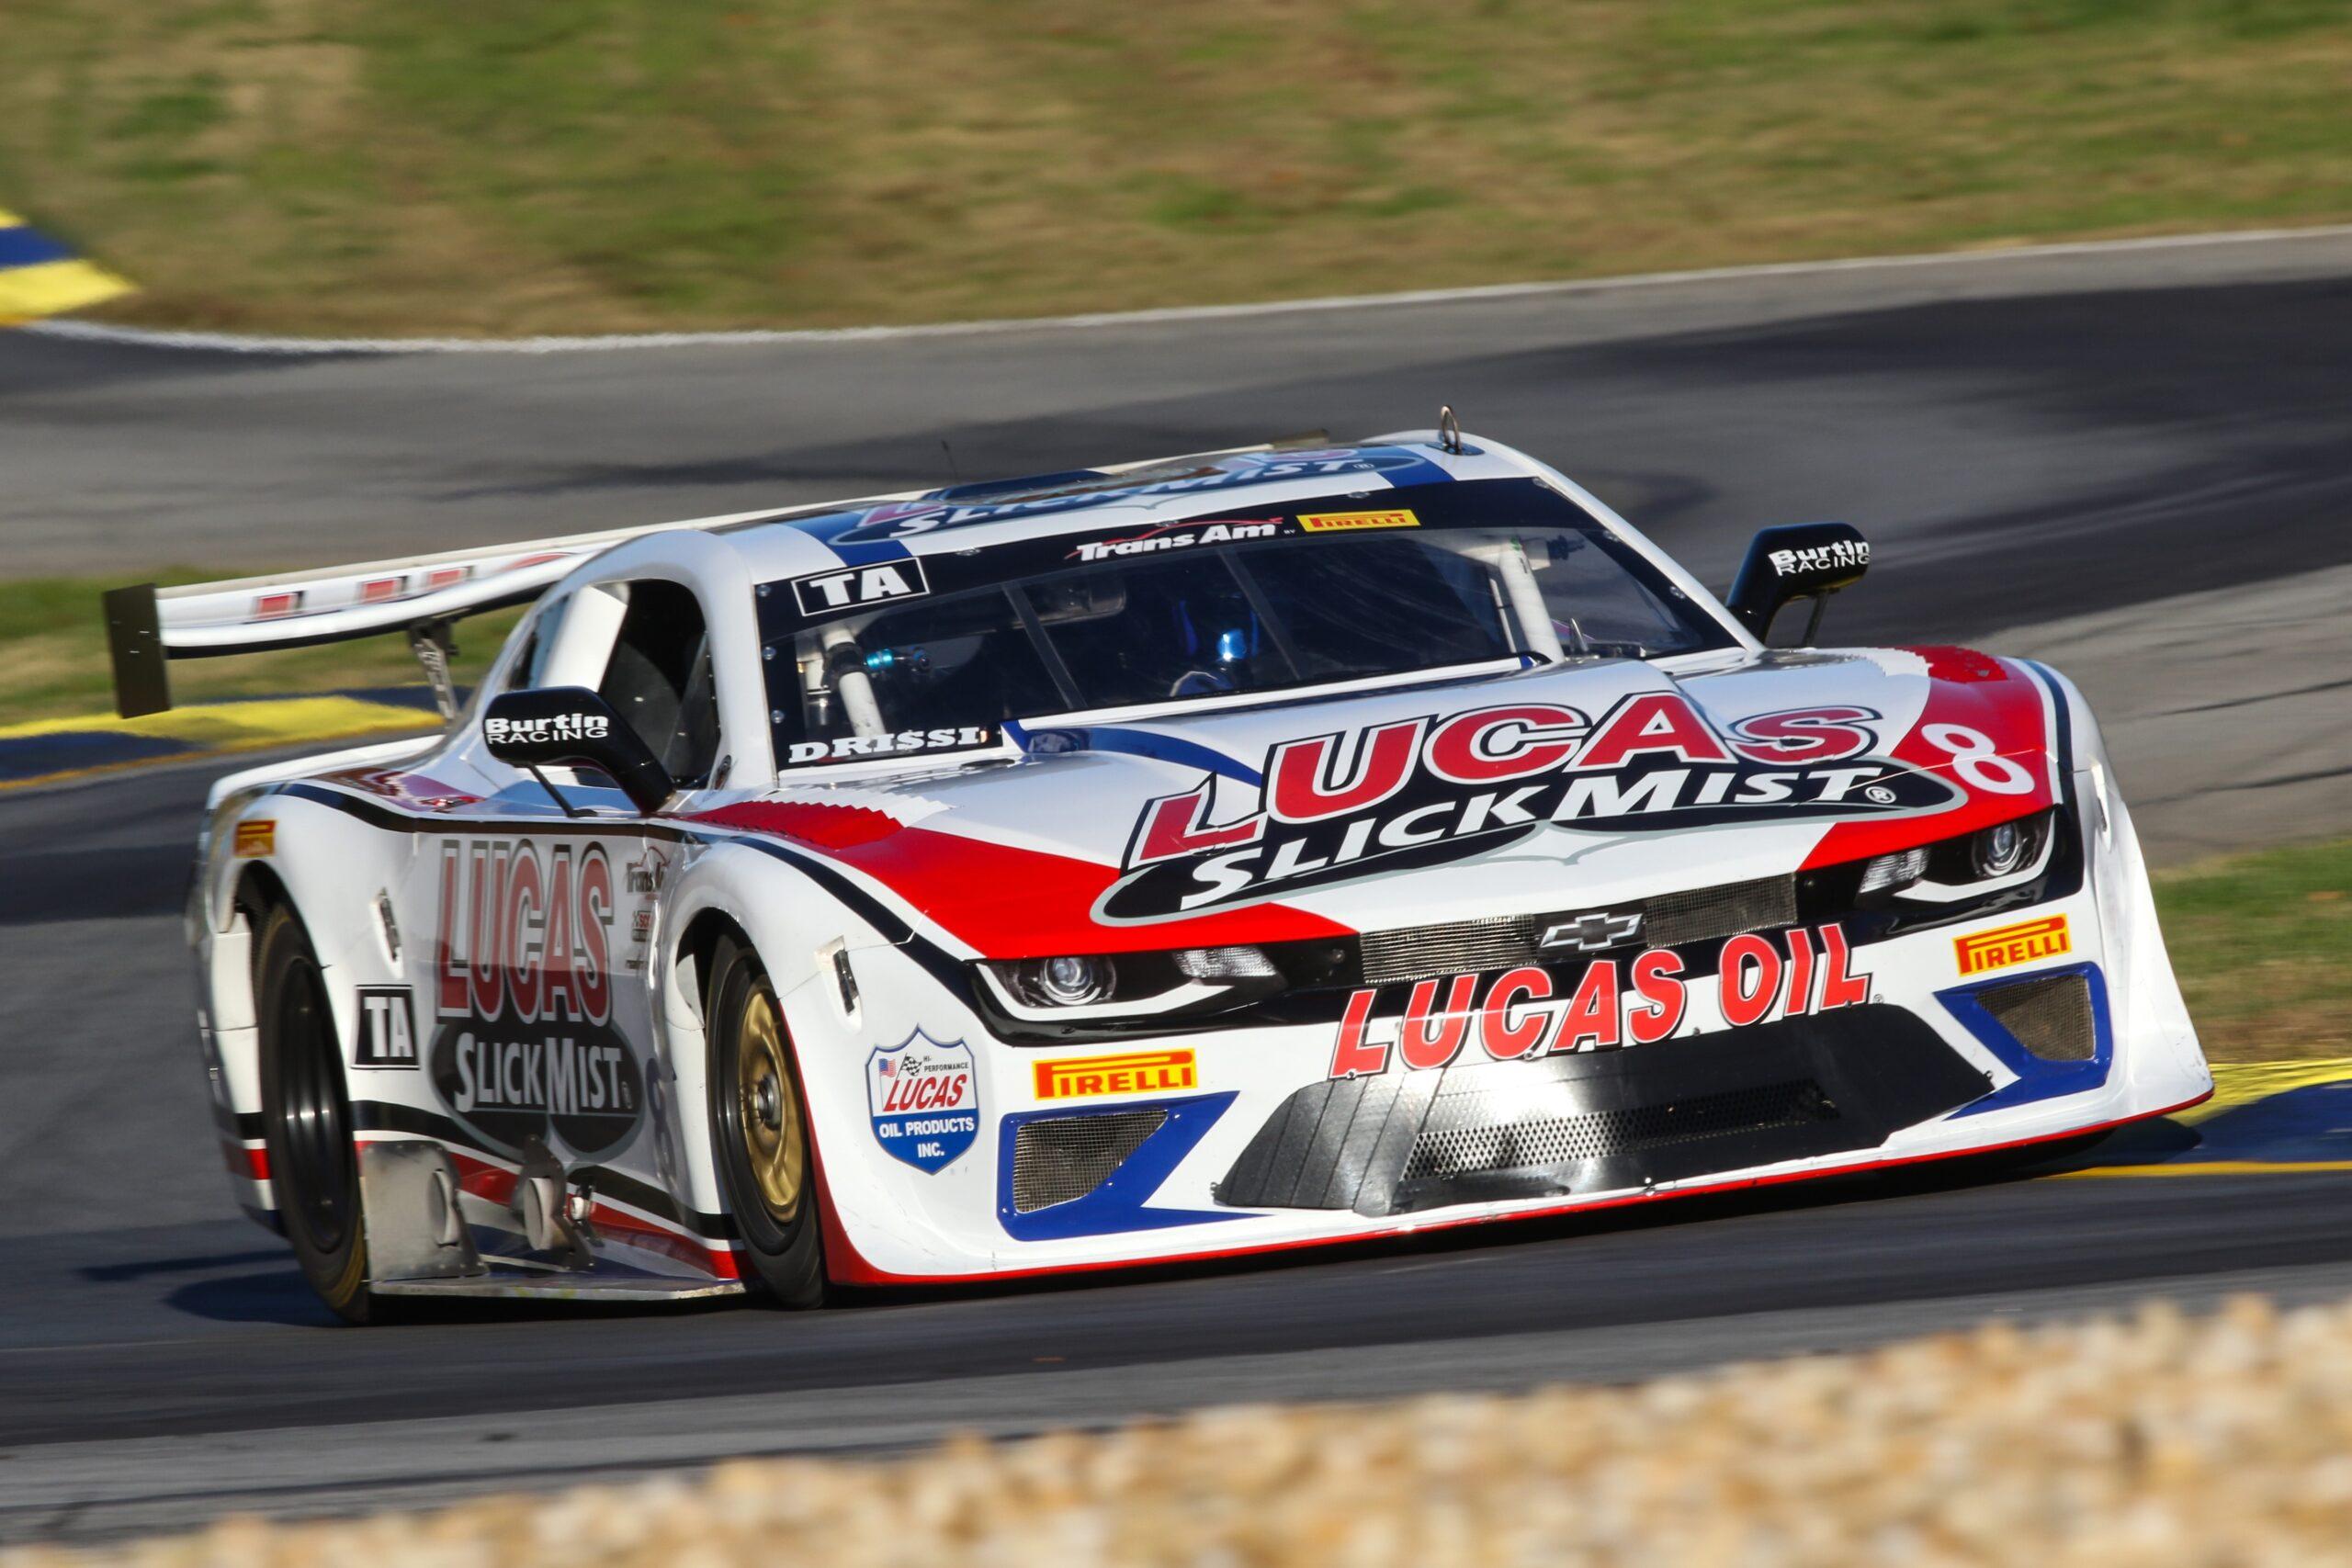 Lucas SlickMist Driver Tomy Drissi Heads To Road Atlanta After Strong Season Start